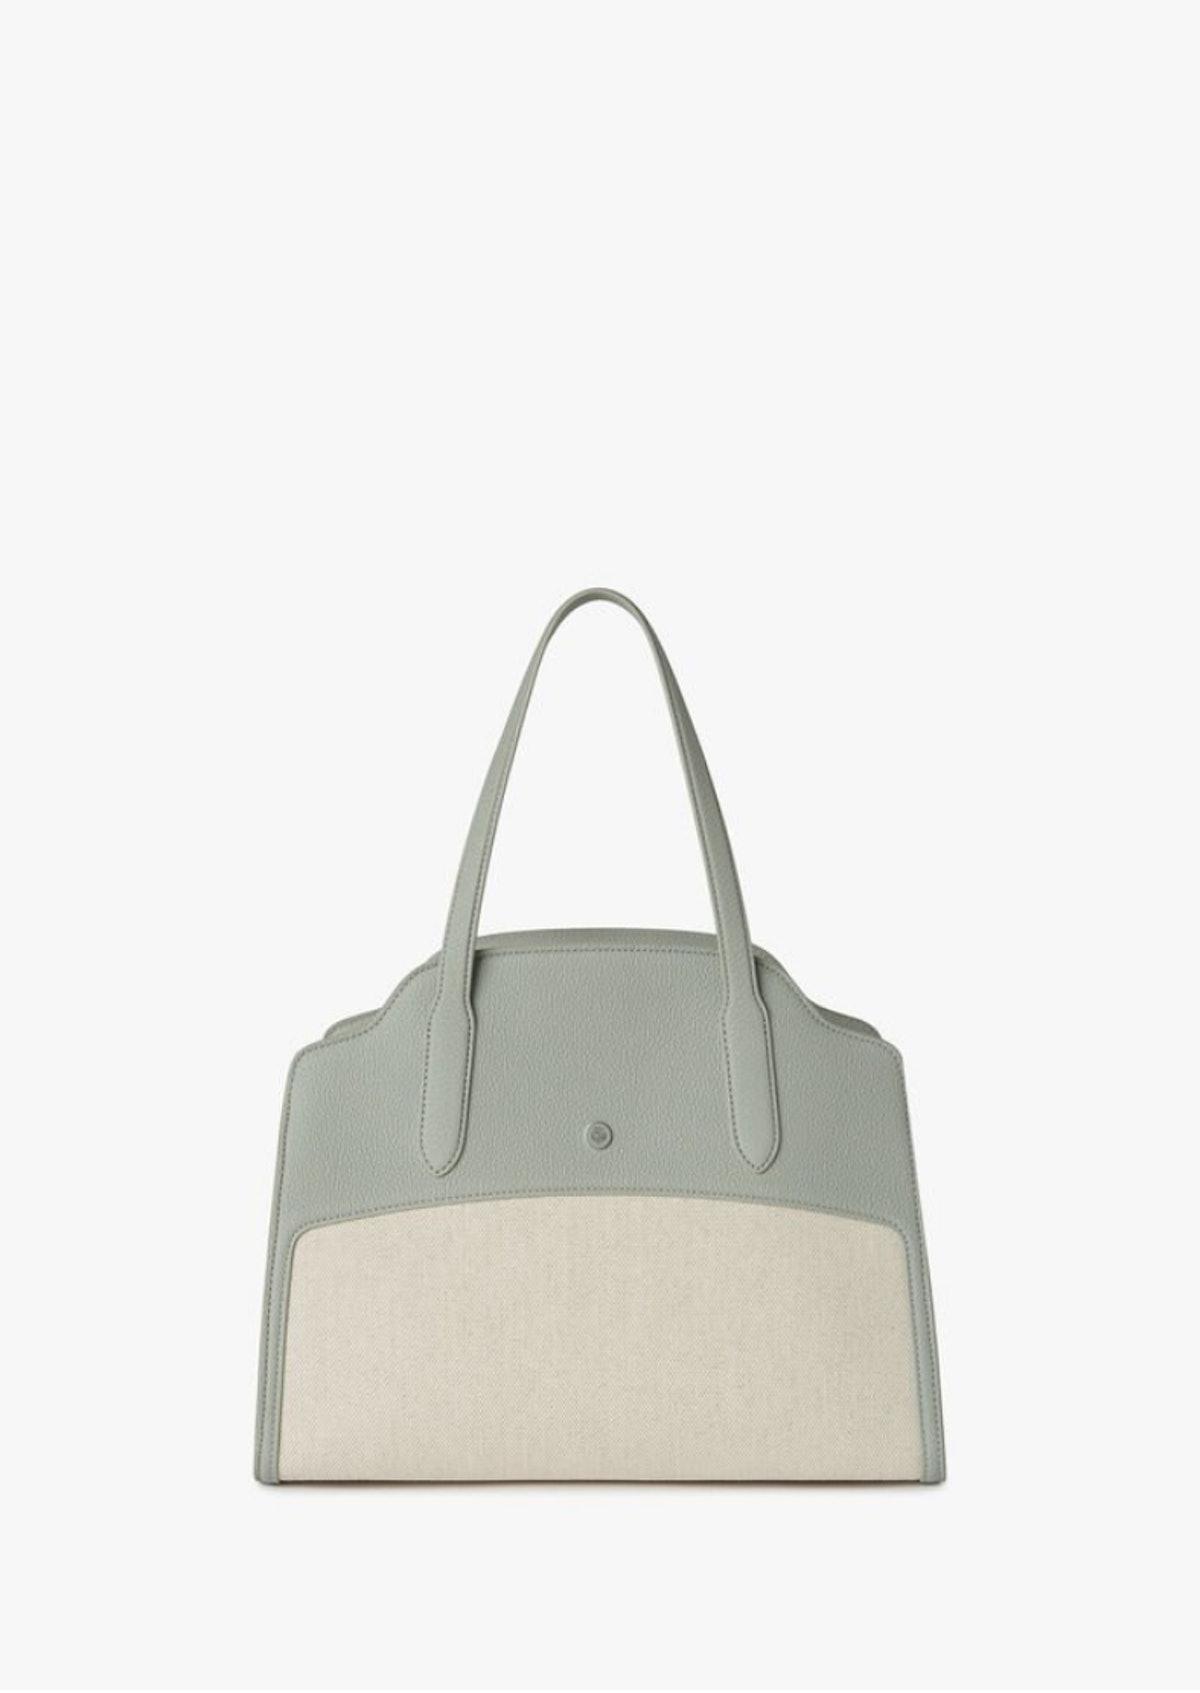 Loro Piana's Sesia Bag in the color natural/eucalyptus.